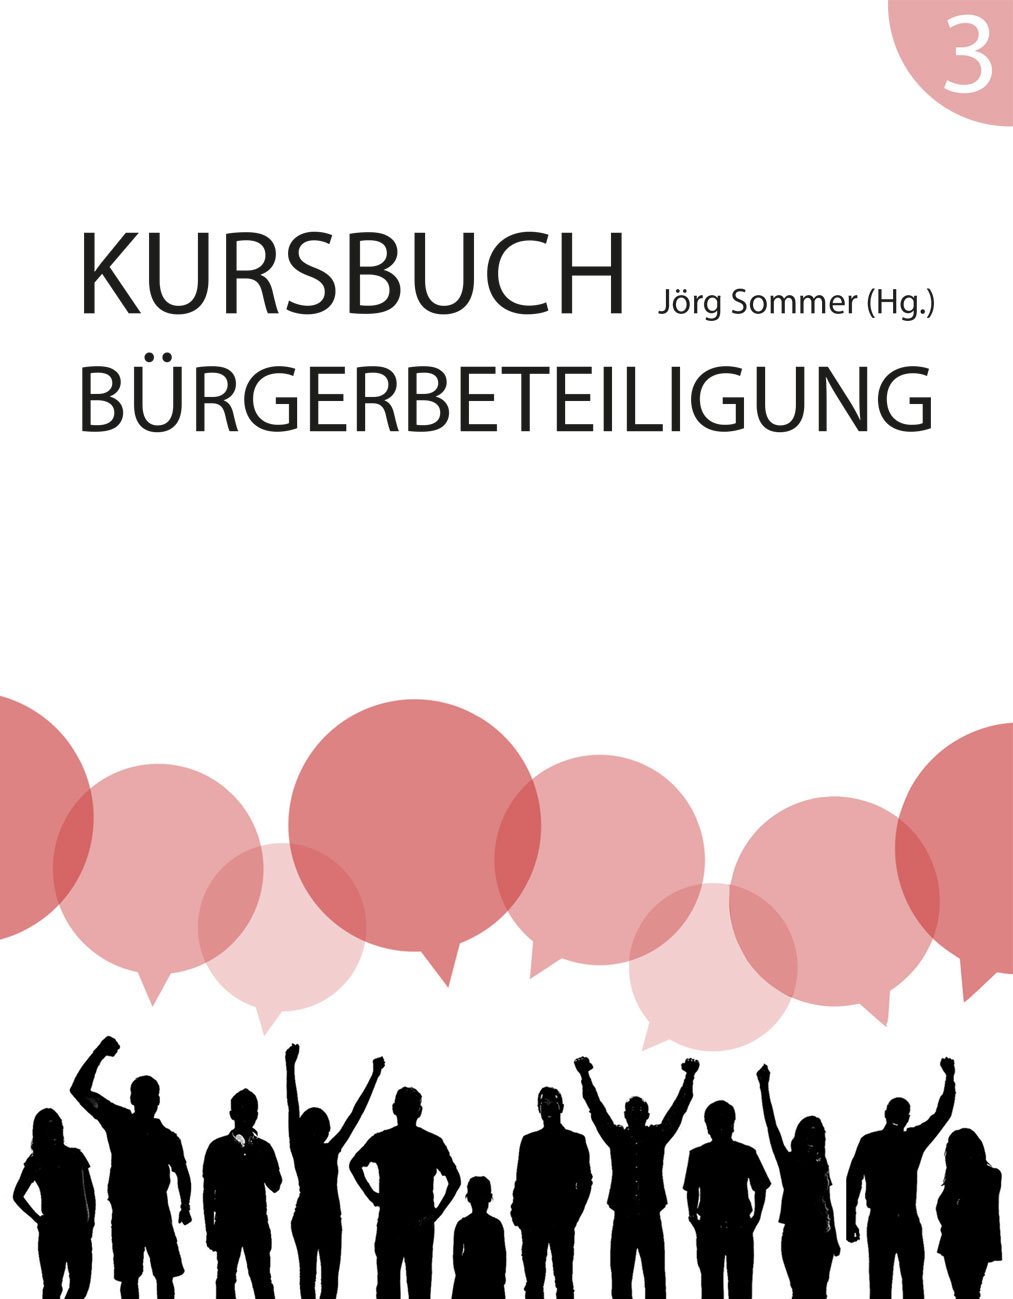 Titel Kursbuch #3